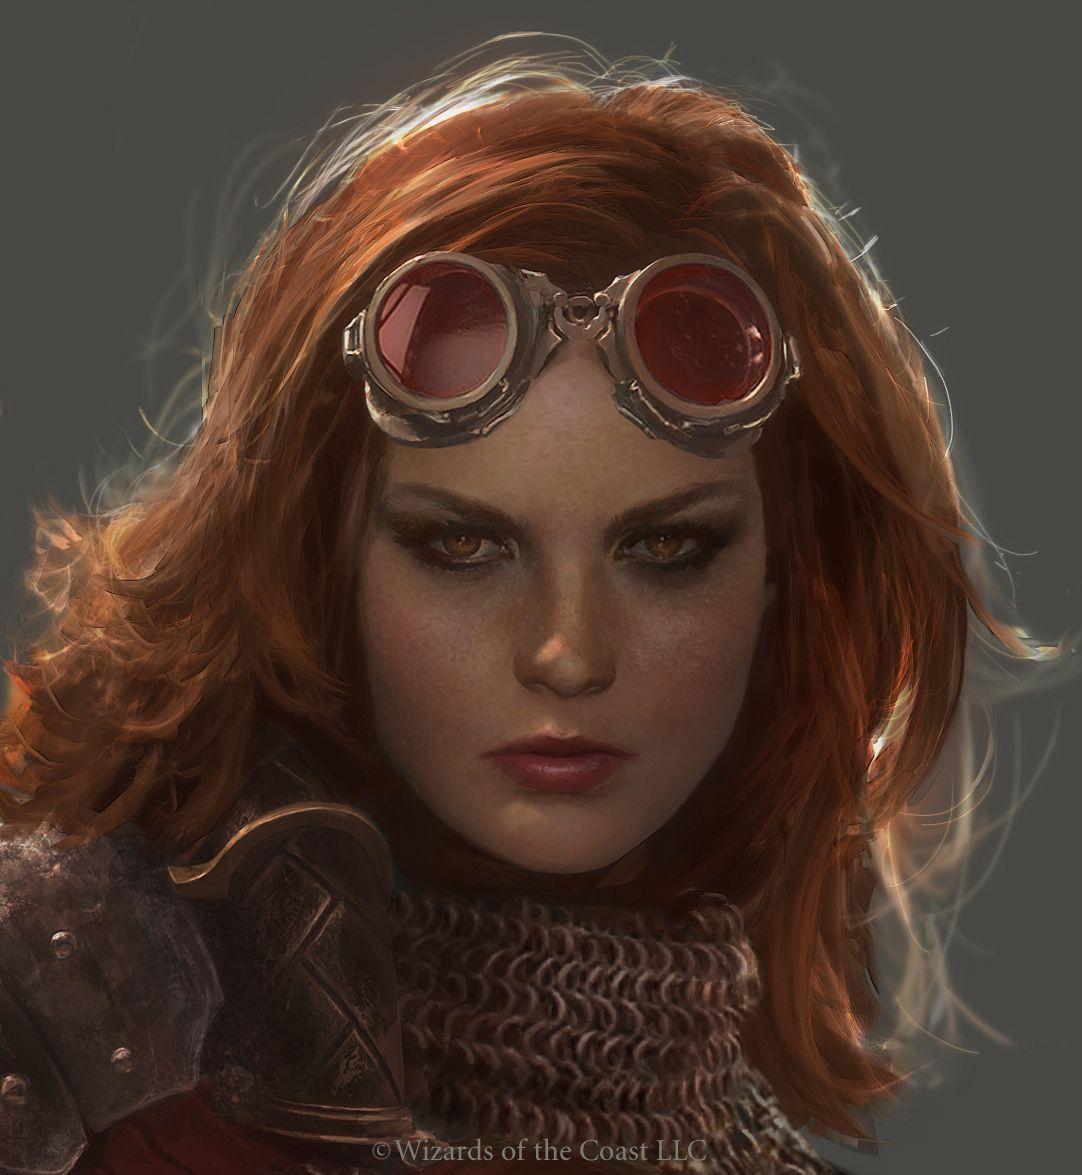 Chandra Portrait by Cryptcrawler.deviantart.com on @deviantART